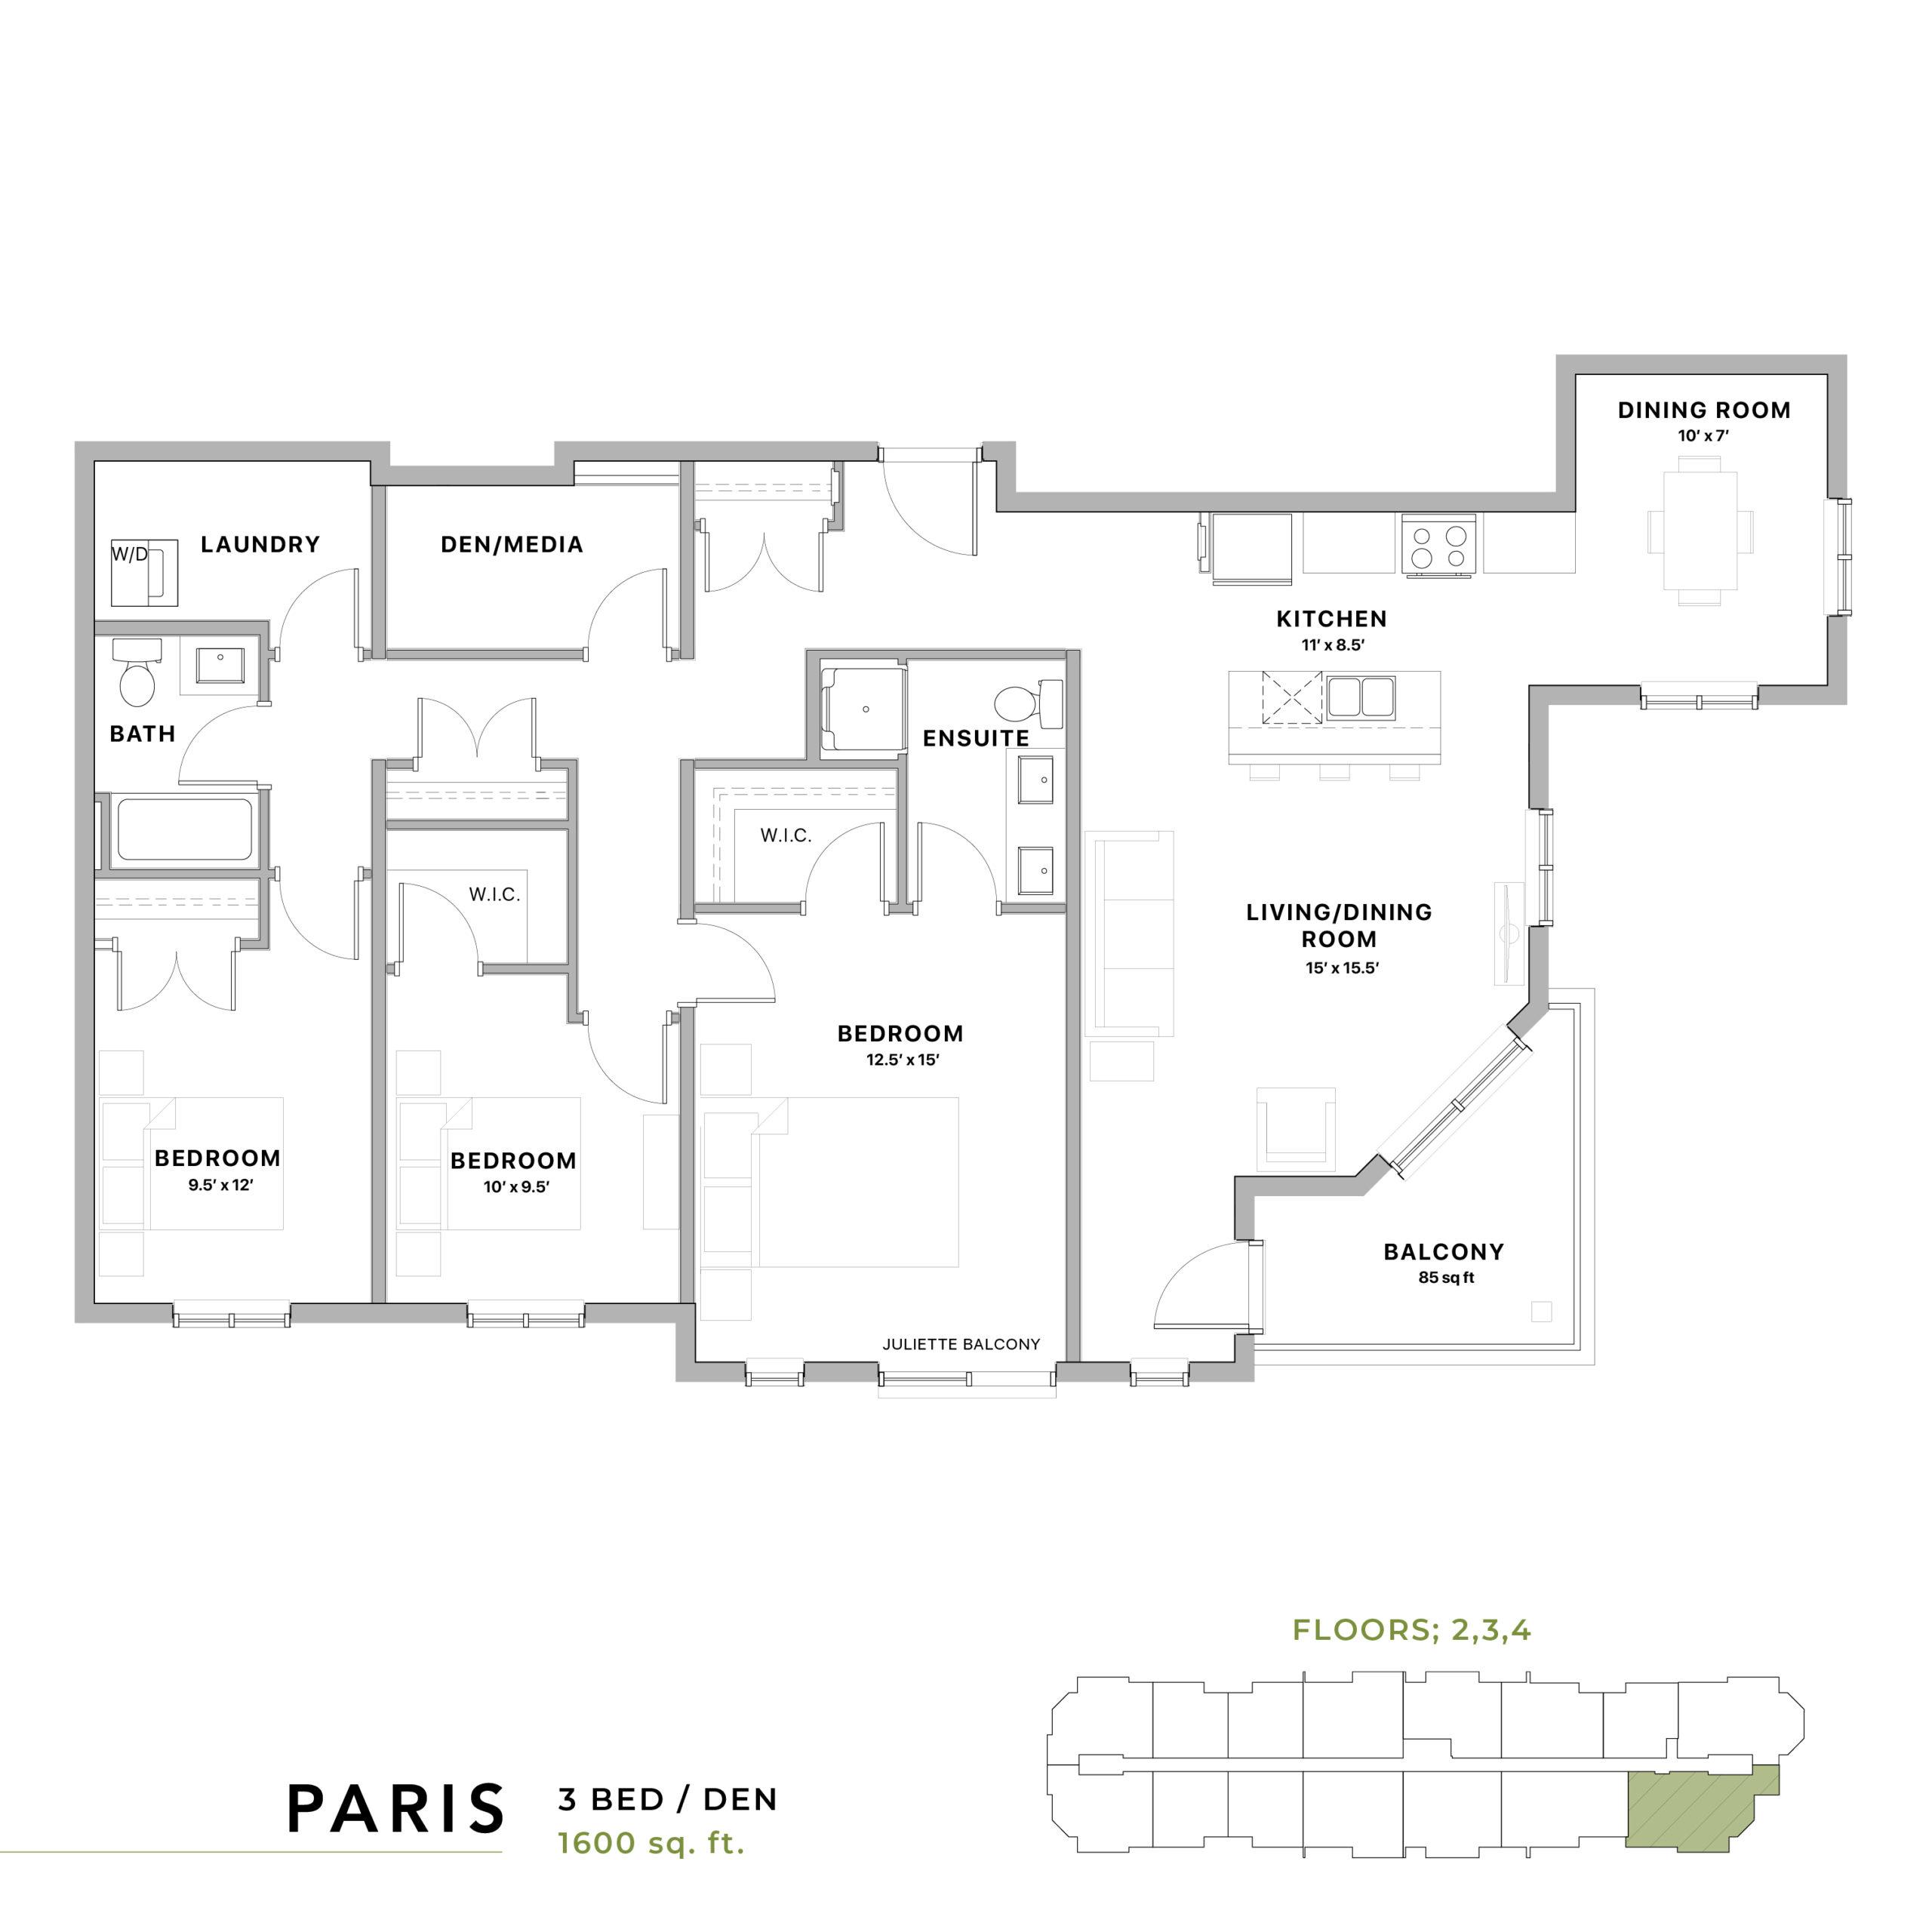 Paris Floorplan